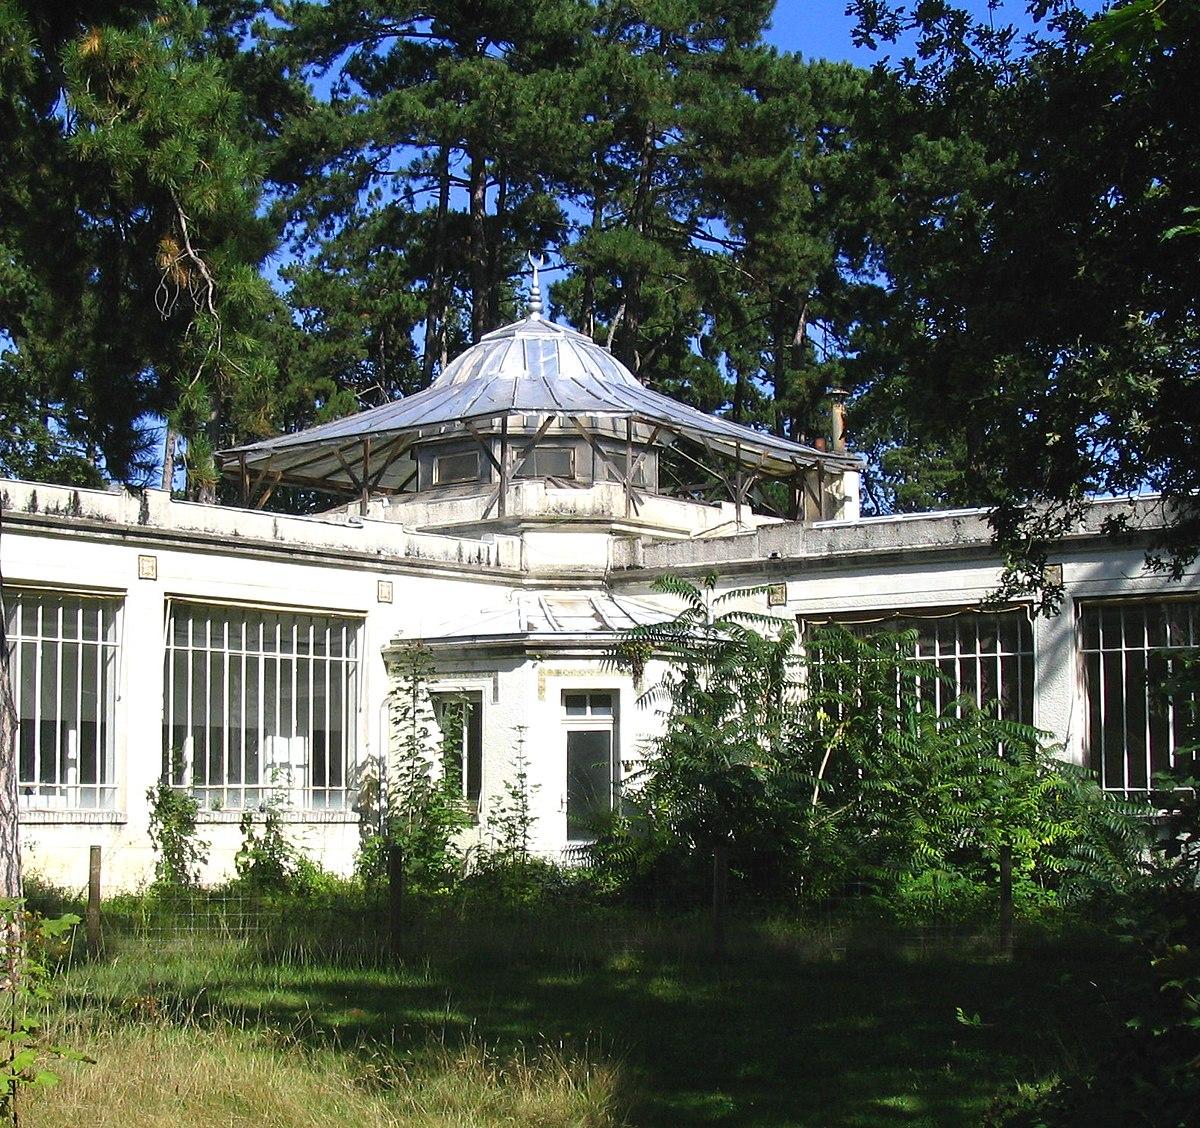 Jardin d 39 agronomie tropicale de paris wikip dia for Jardin indochine